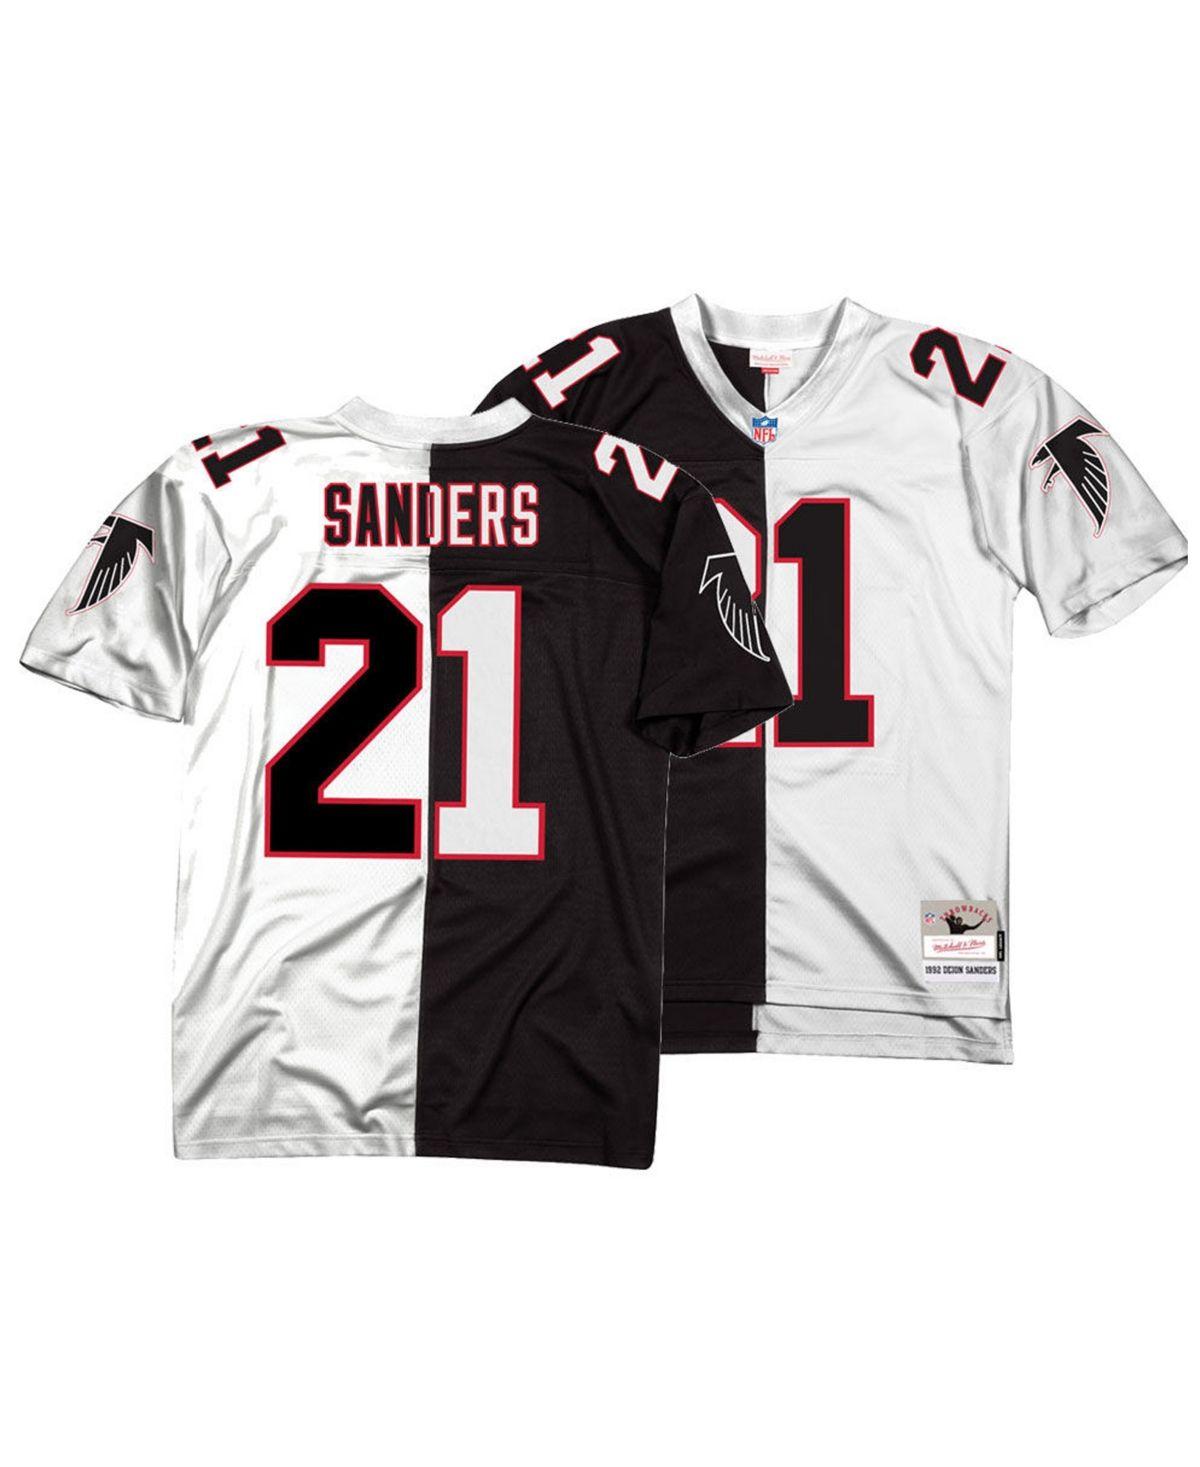 deion sanders falcons jersey